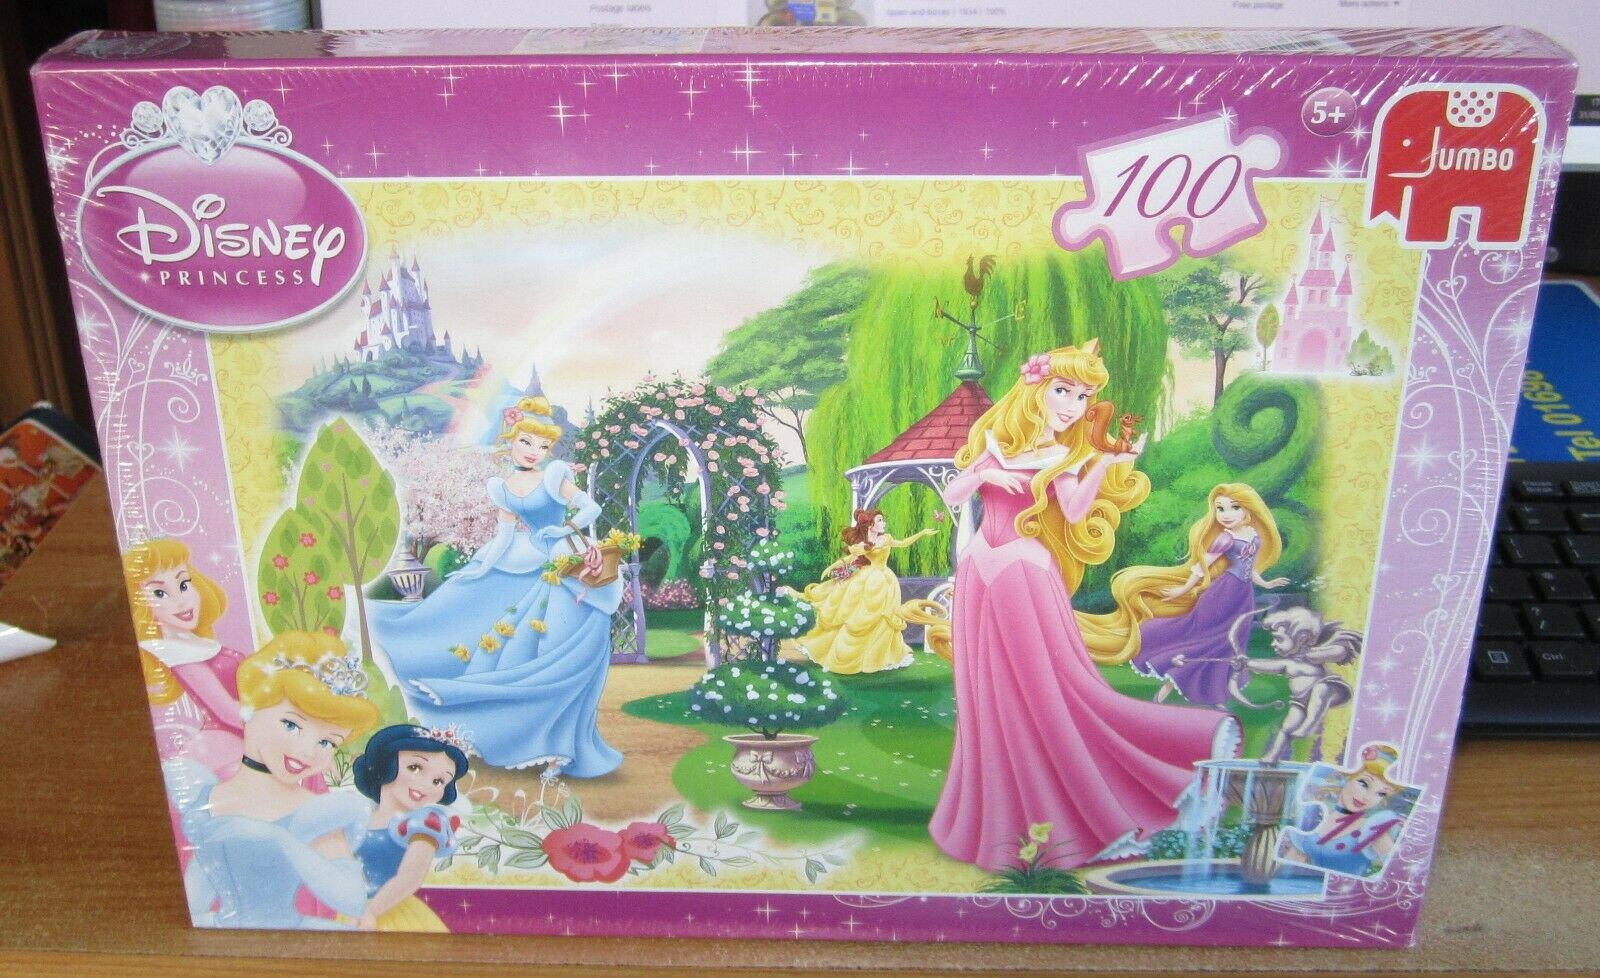 Disney Princess 100 Piece Jumbo Jigsaw